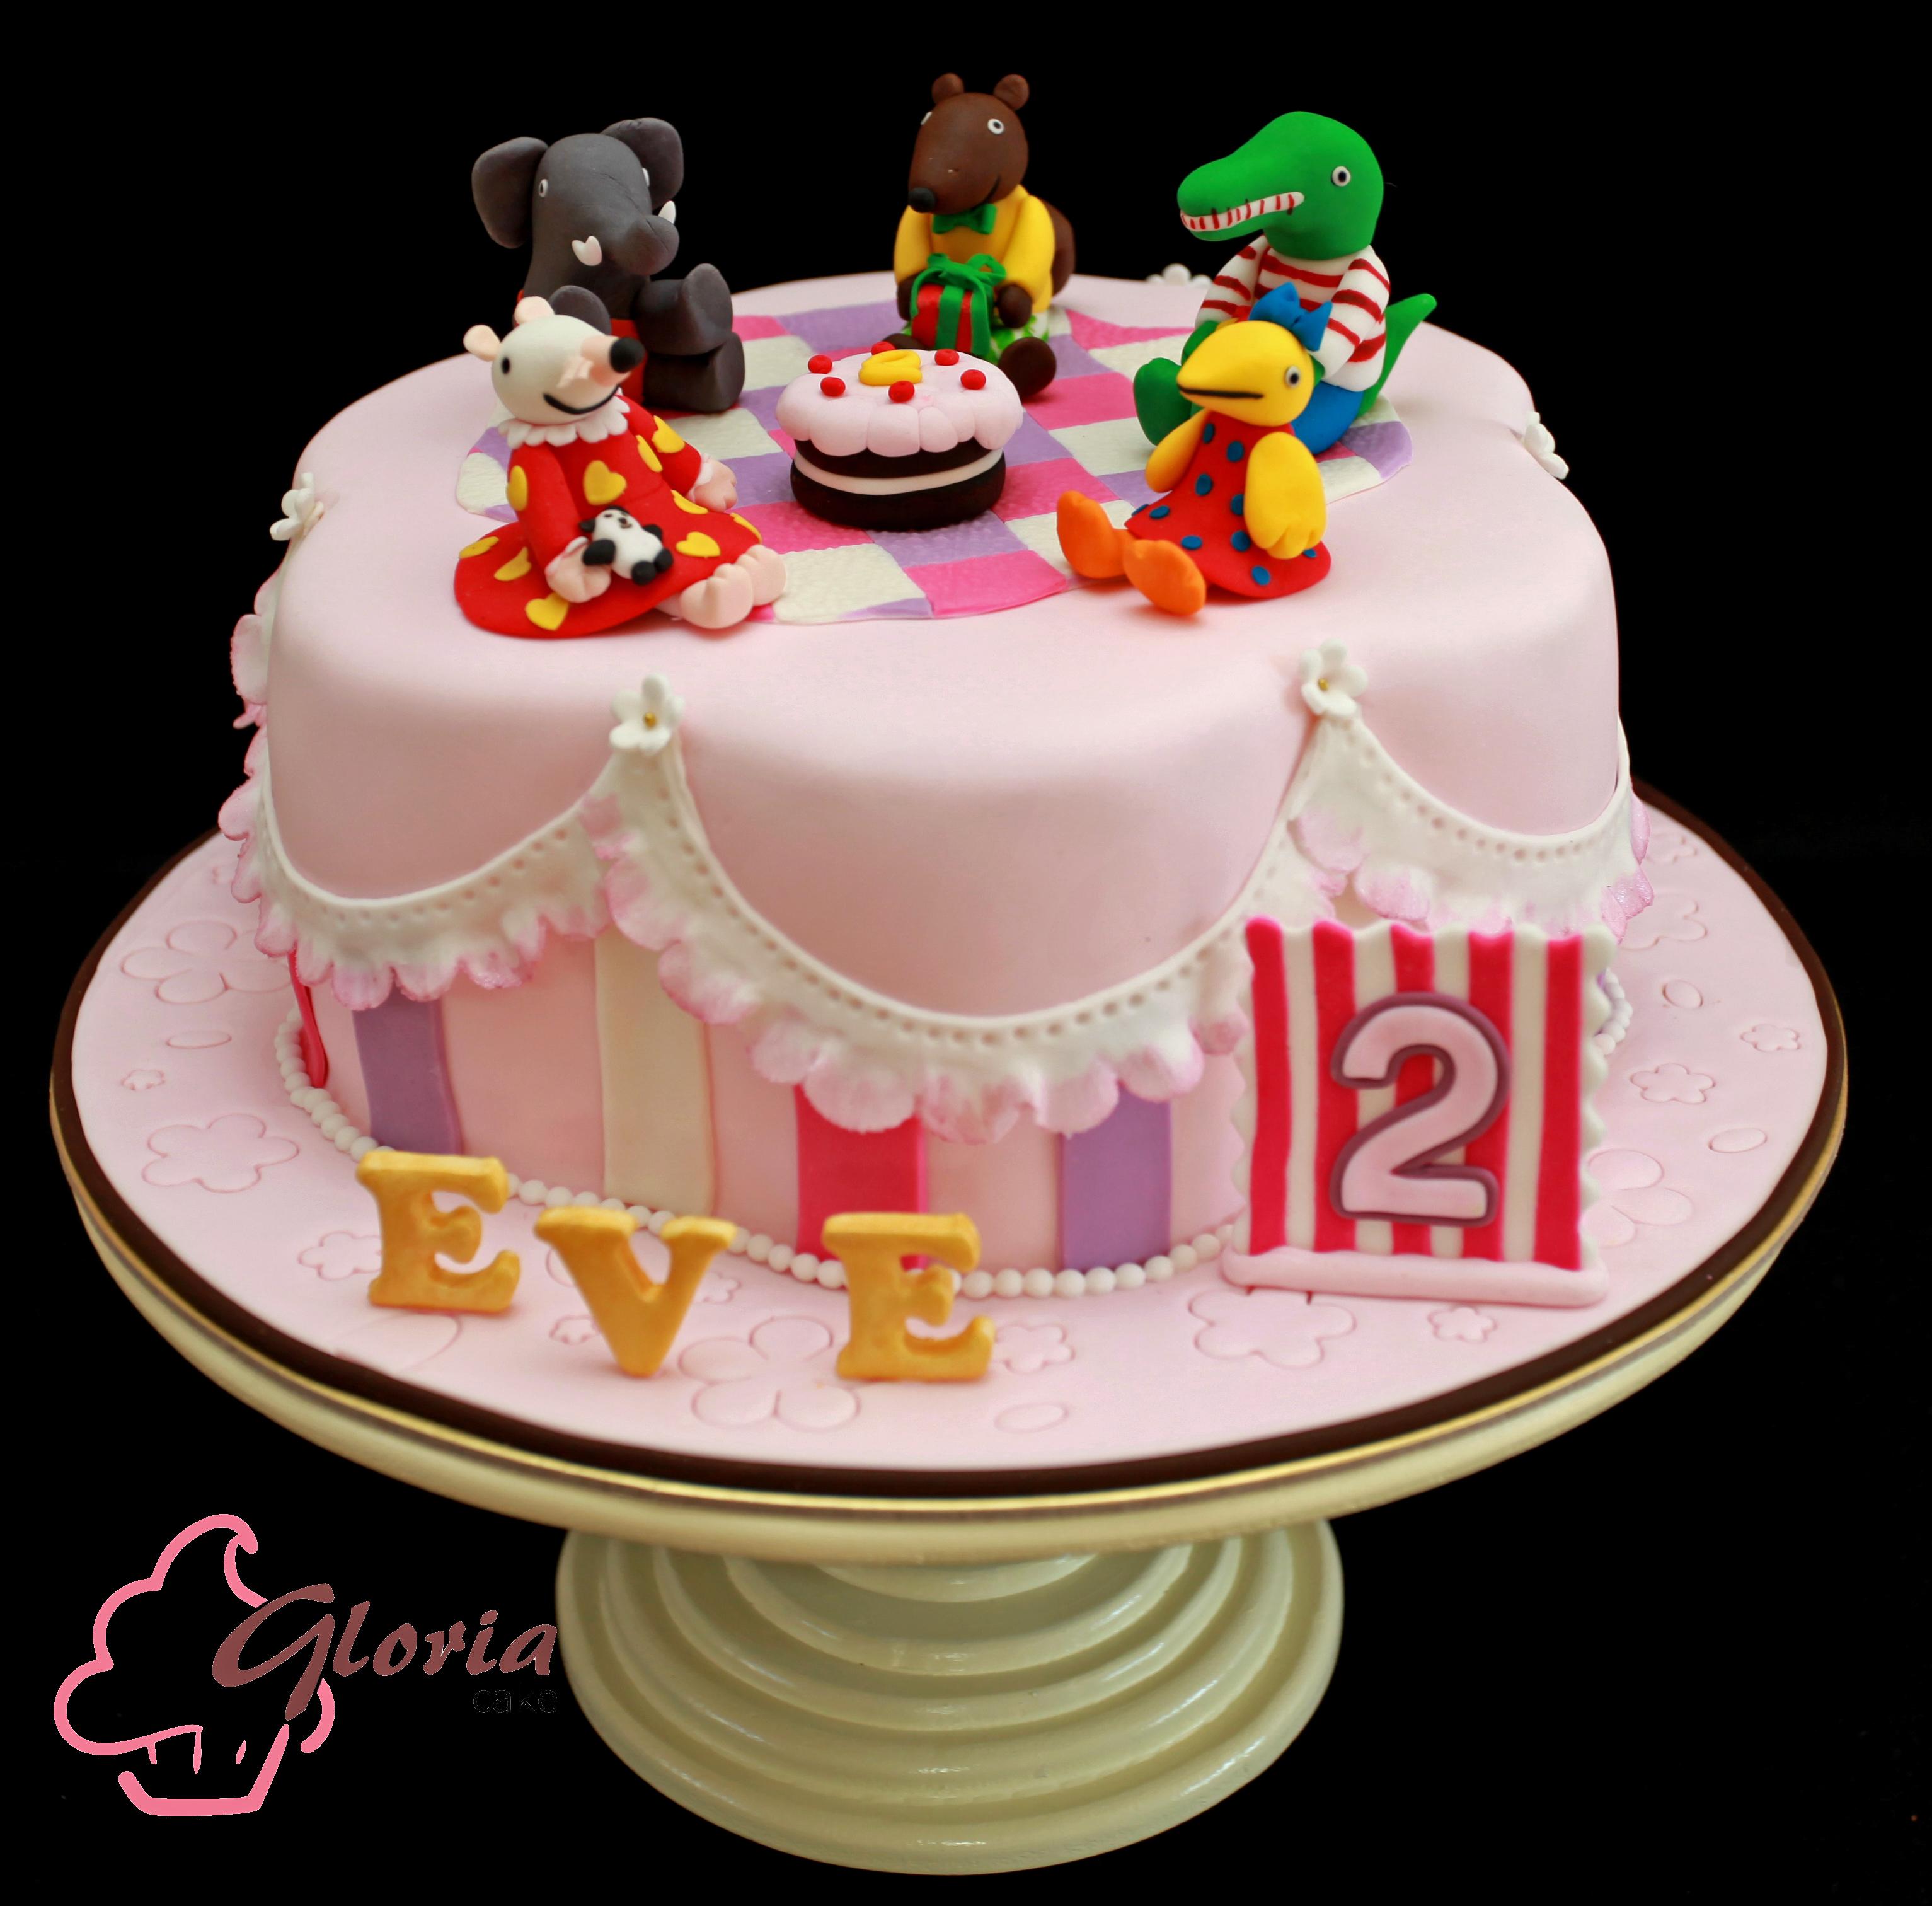 Maisy and Friends Birthday Cake